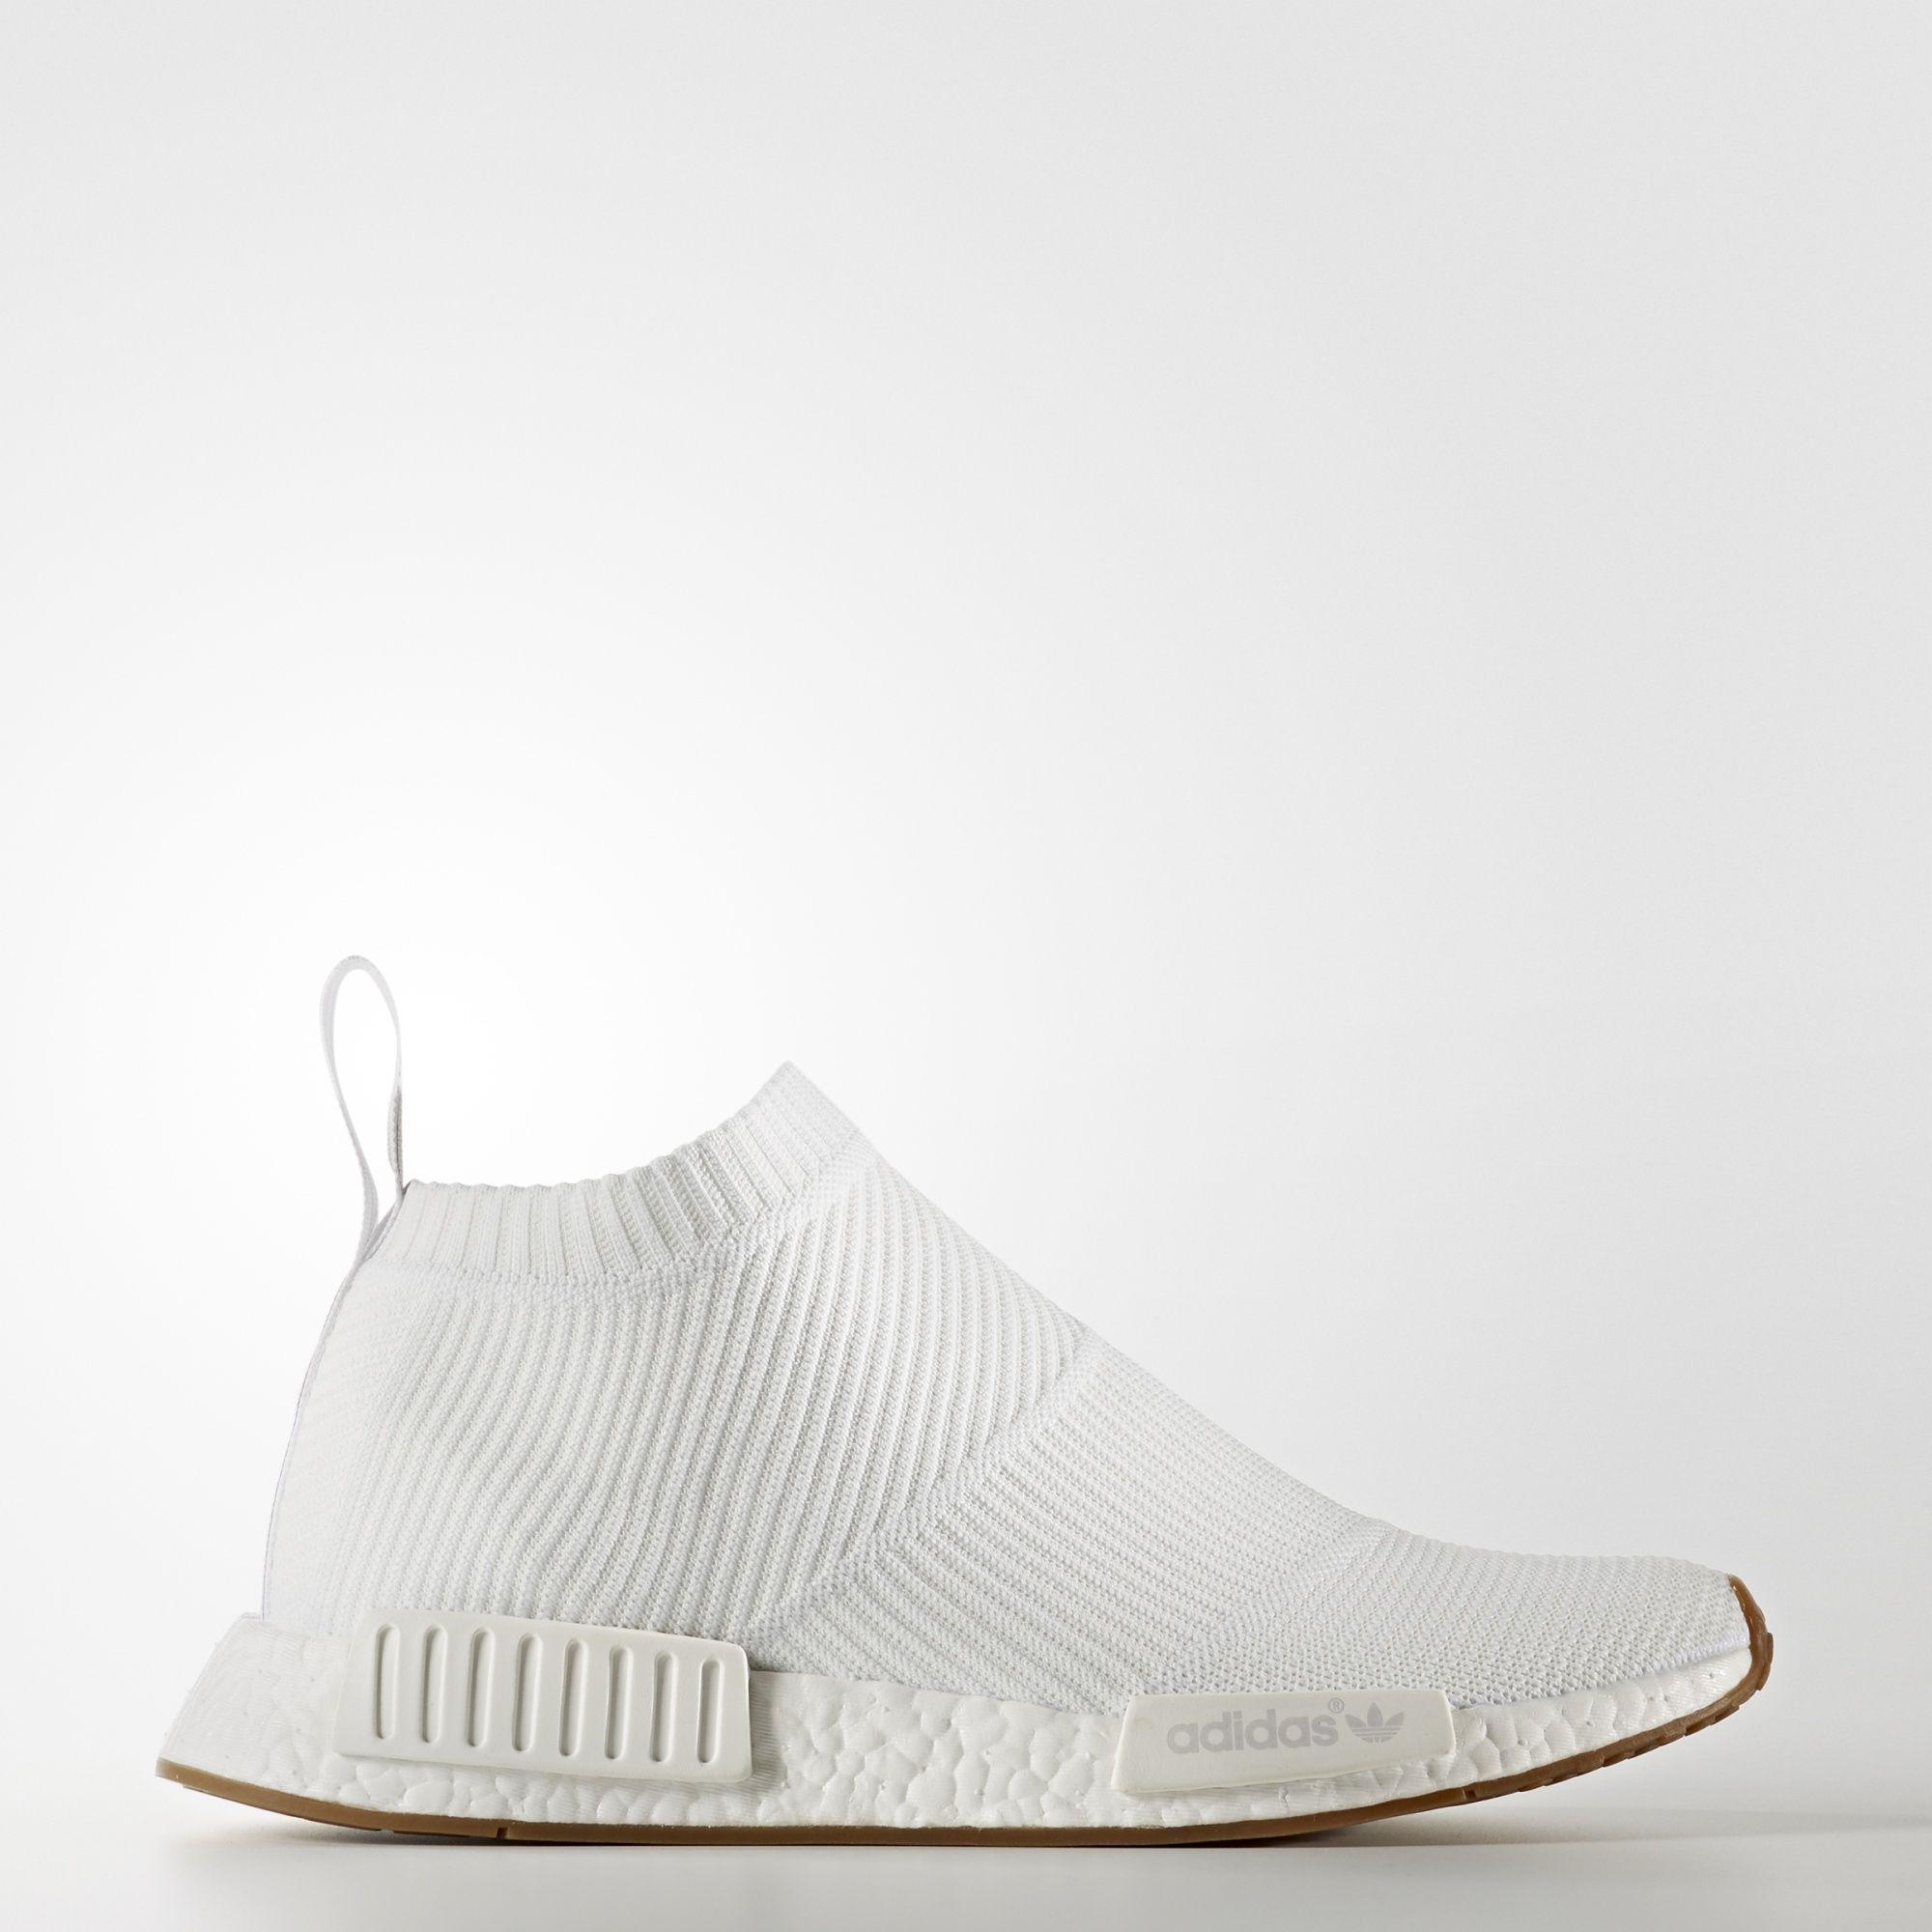 adidas NMD_CS1 Primeknit Shoes | Knit shoes, Adidas